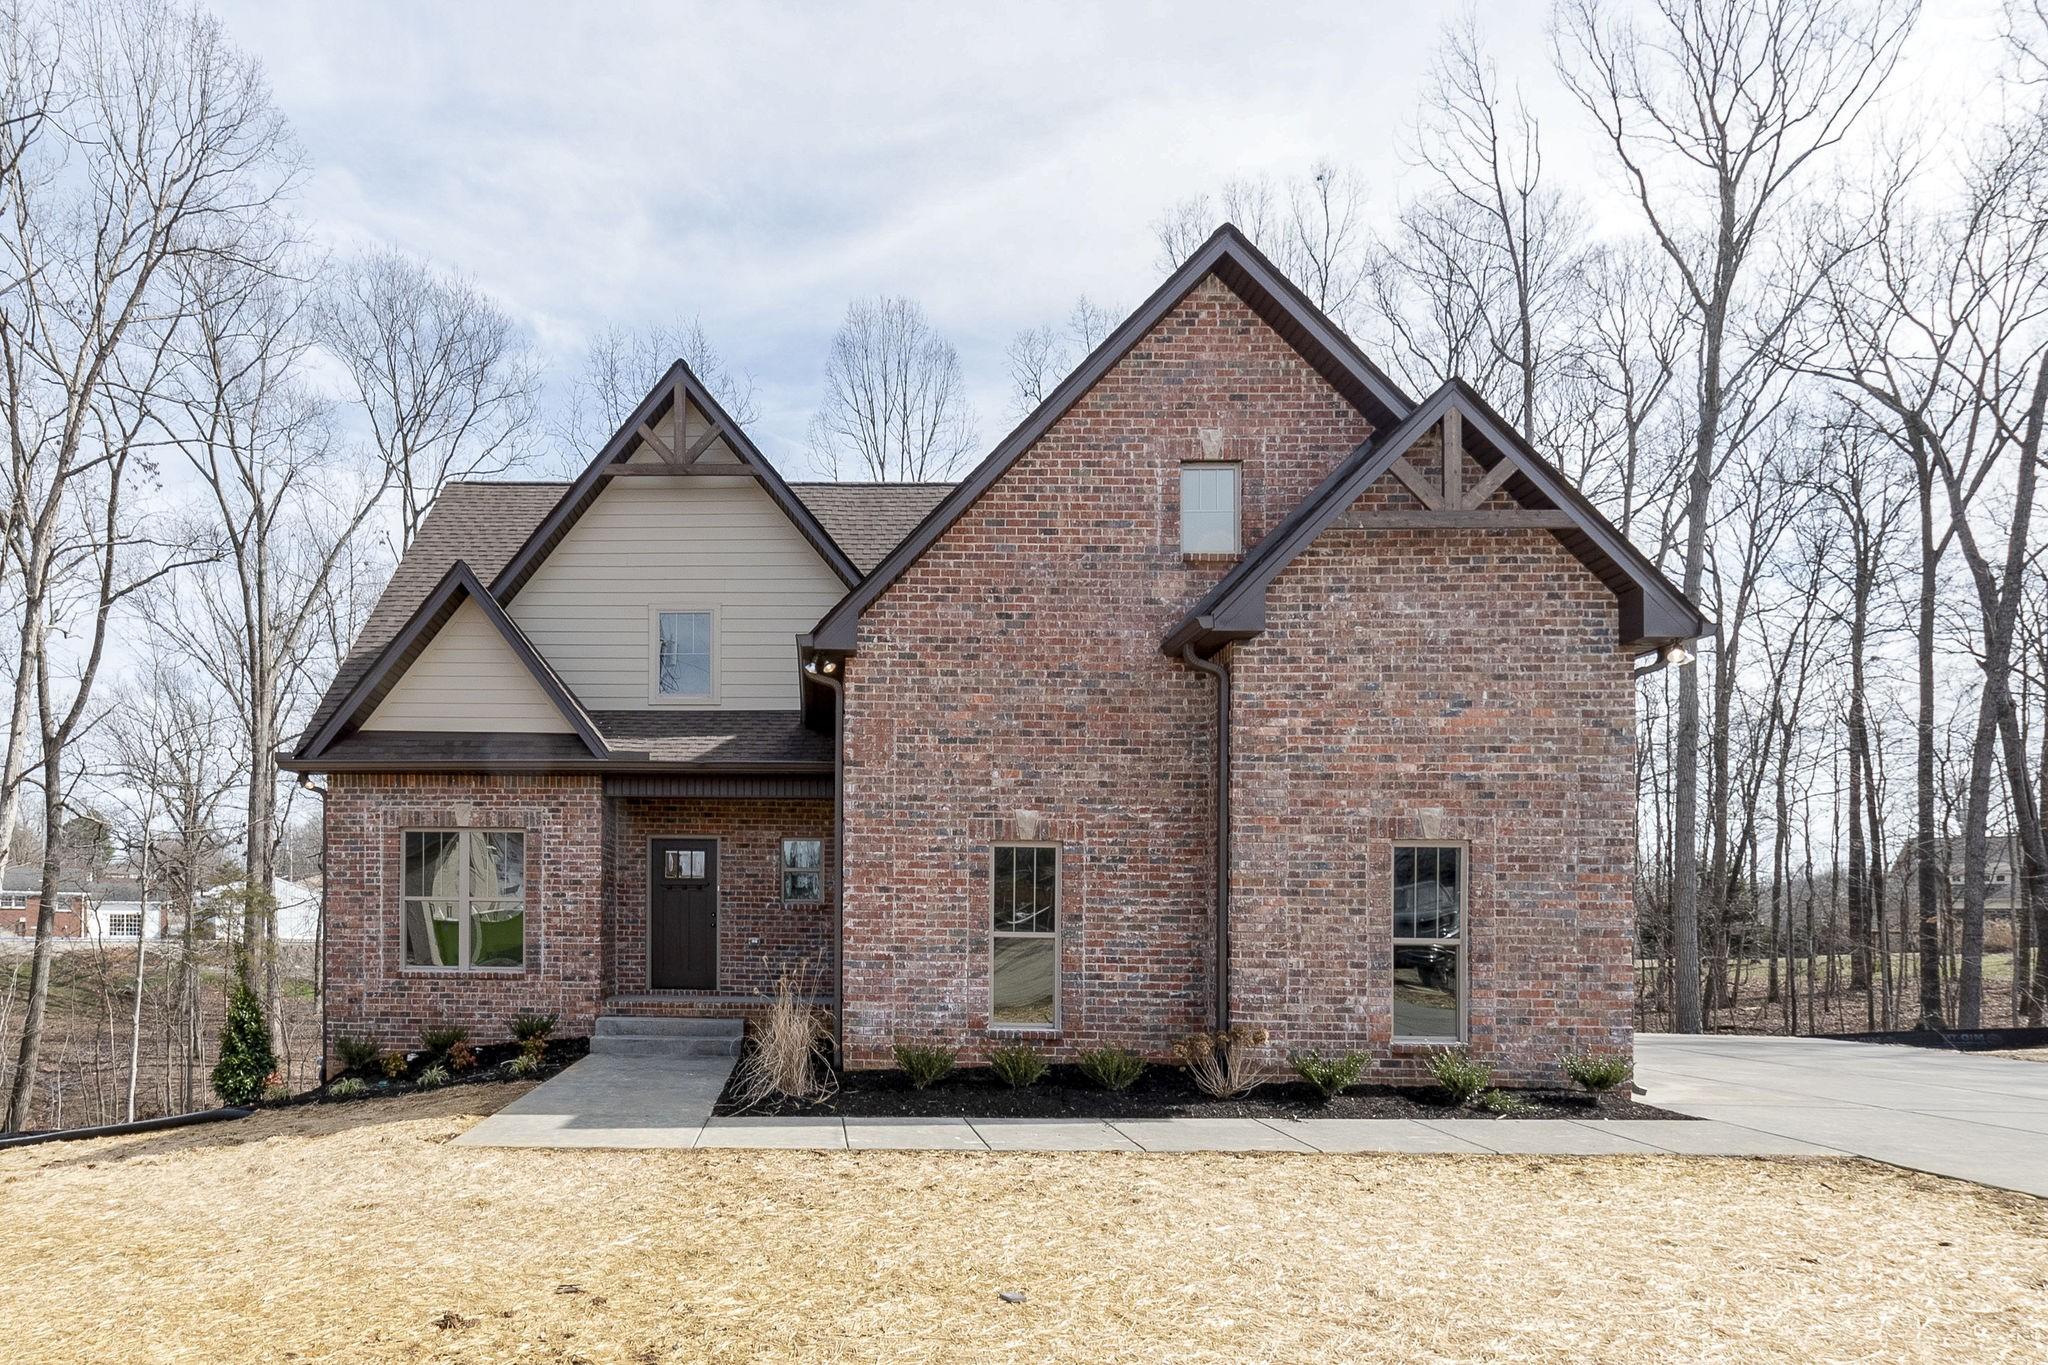 5049 E Mayflower Ct, Greenbrier, TN 37073 - Greenbrier, TN real estate listing